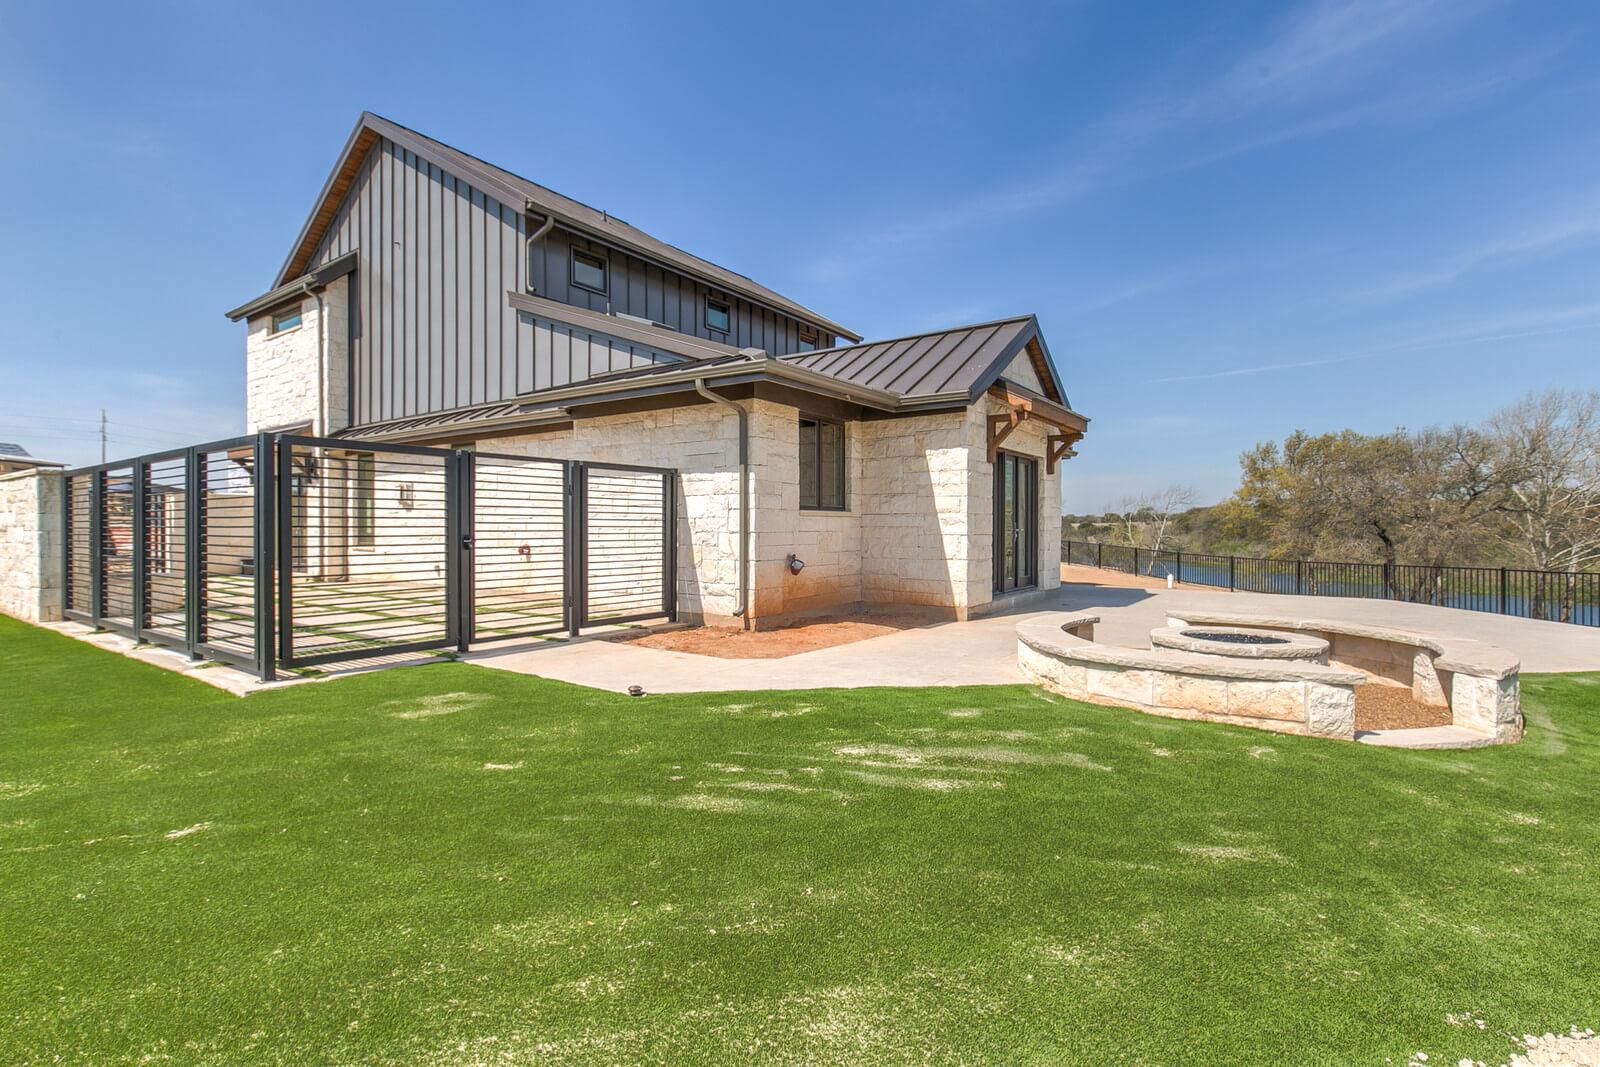 Steve-Bumpas-Custom-Homes-The-Residences-at-Rough-Creek-Lodge-Delta-54.jpg